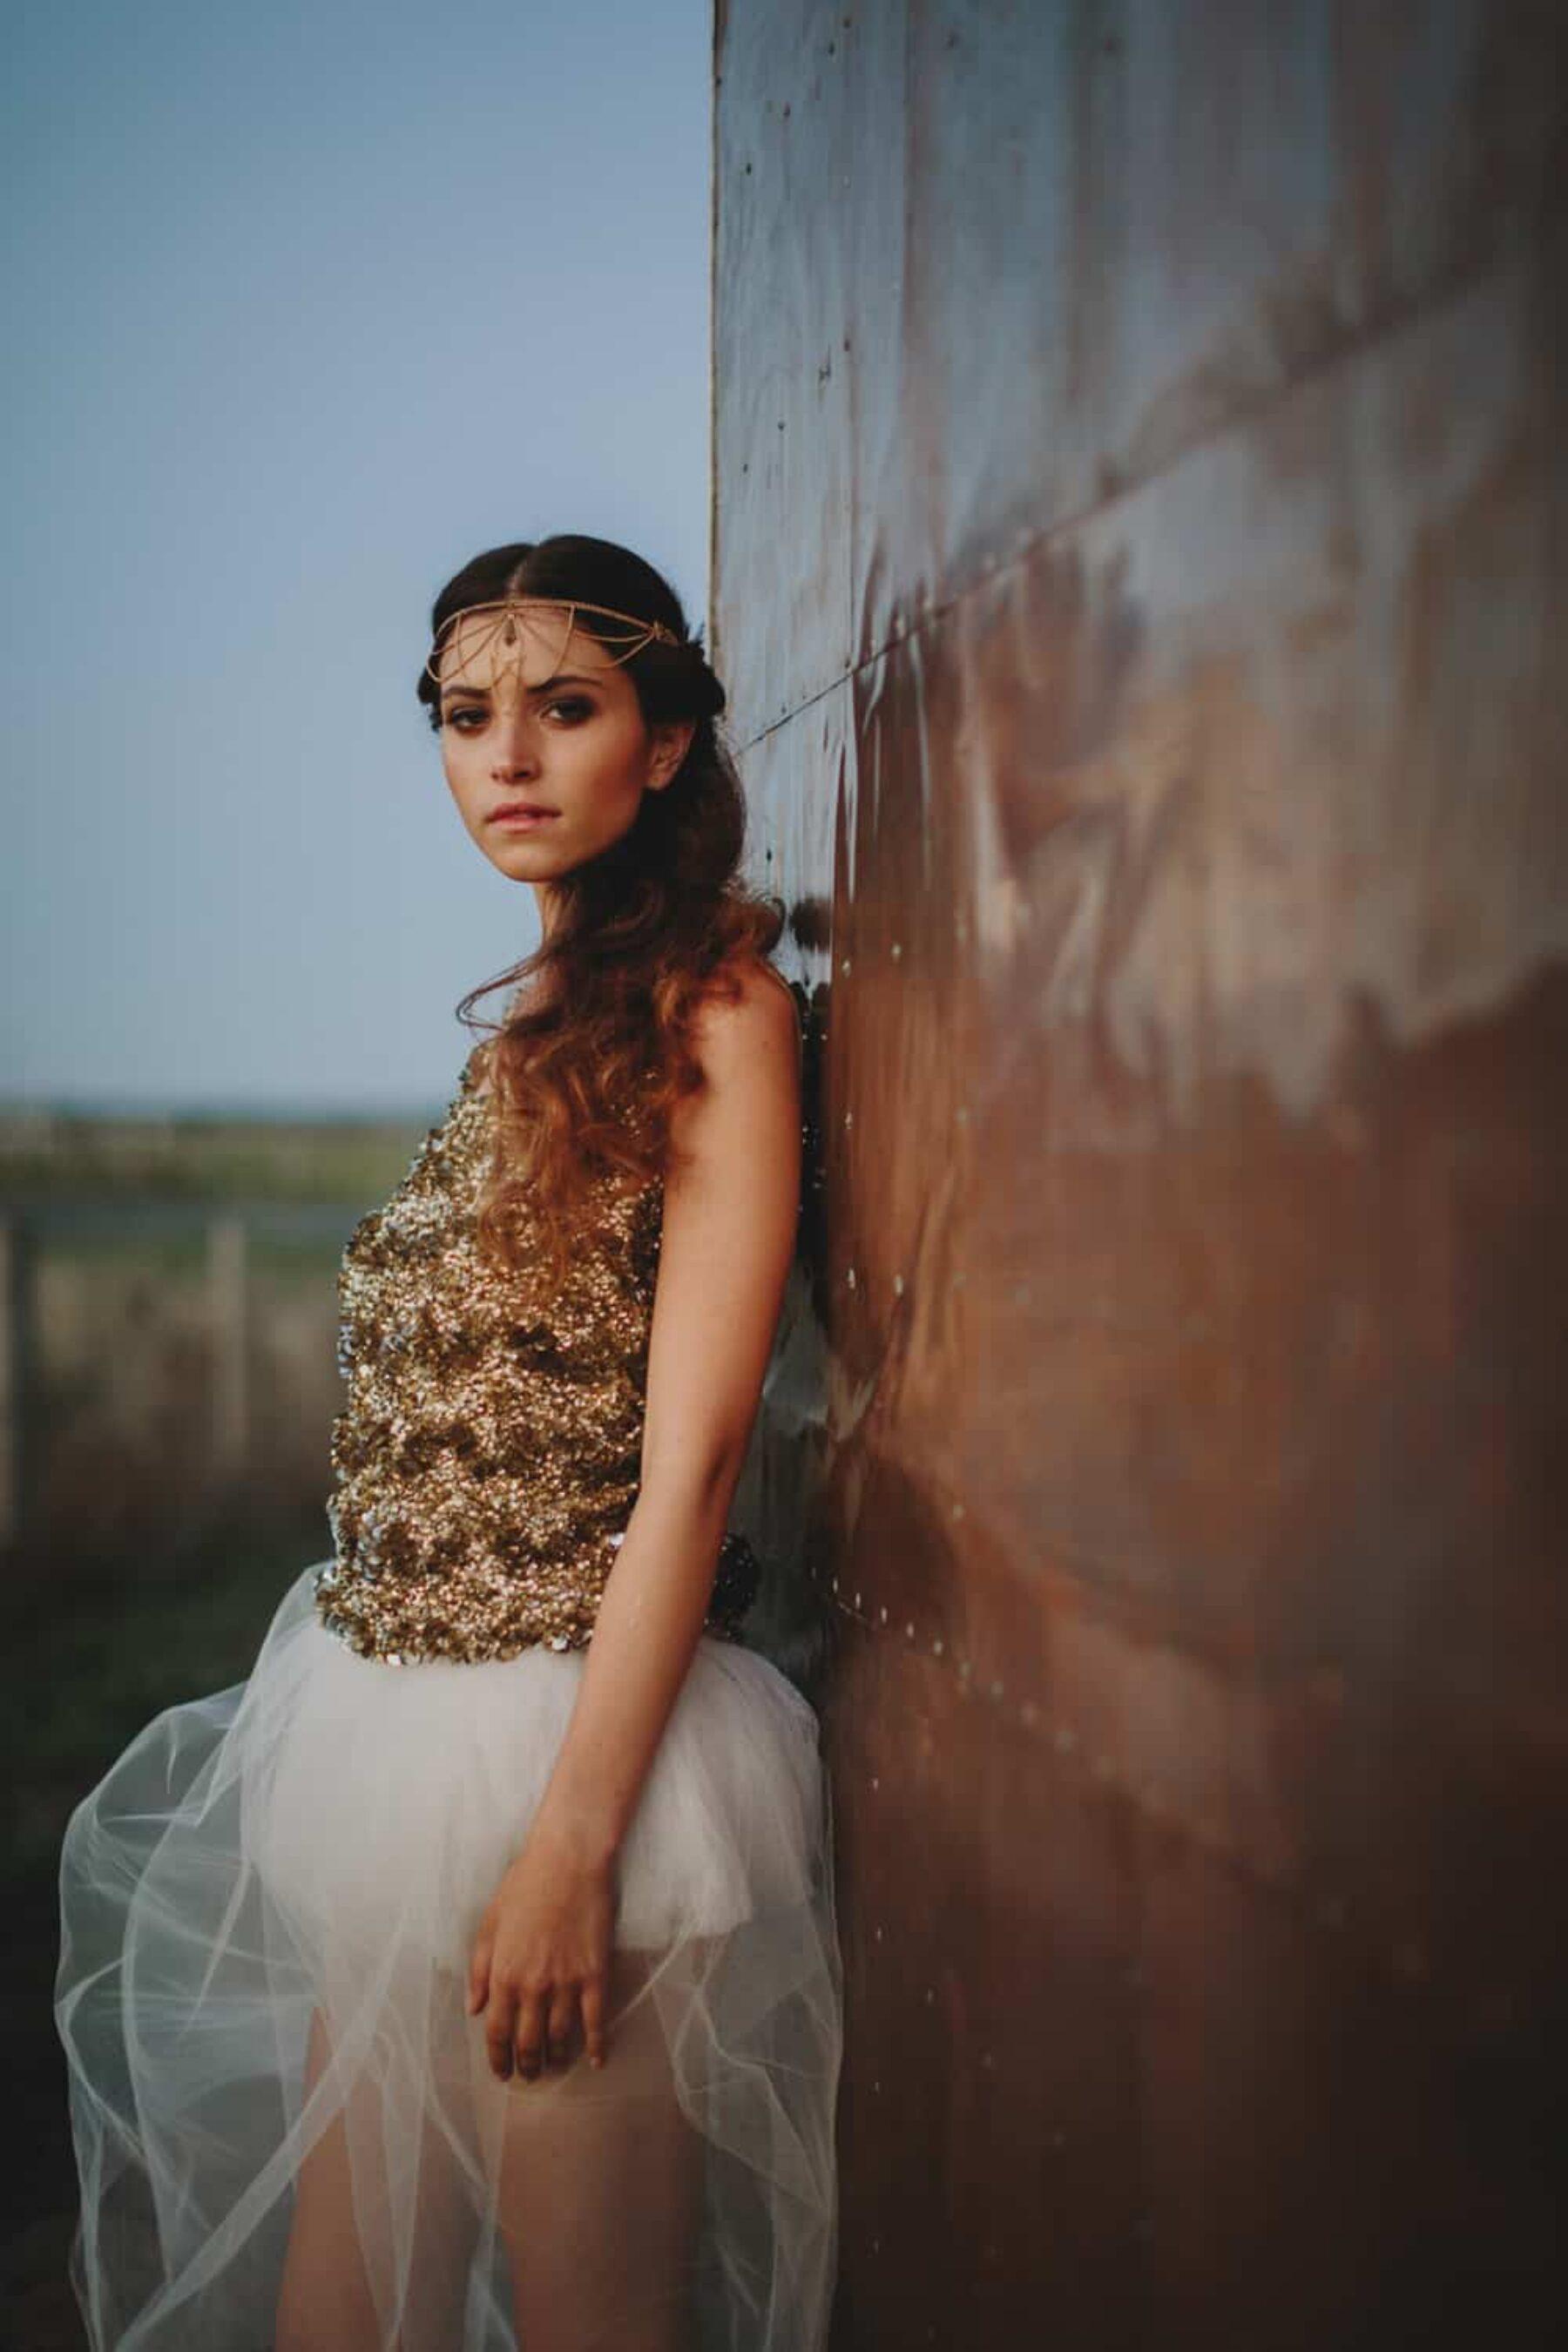 gold wedding dress and headpiece